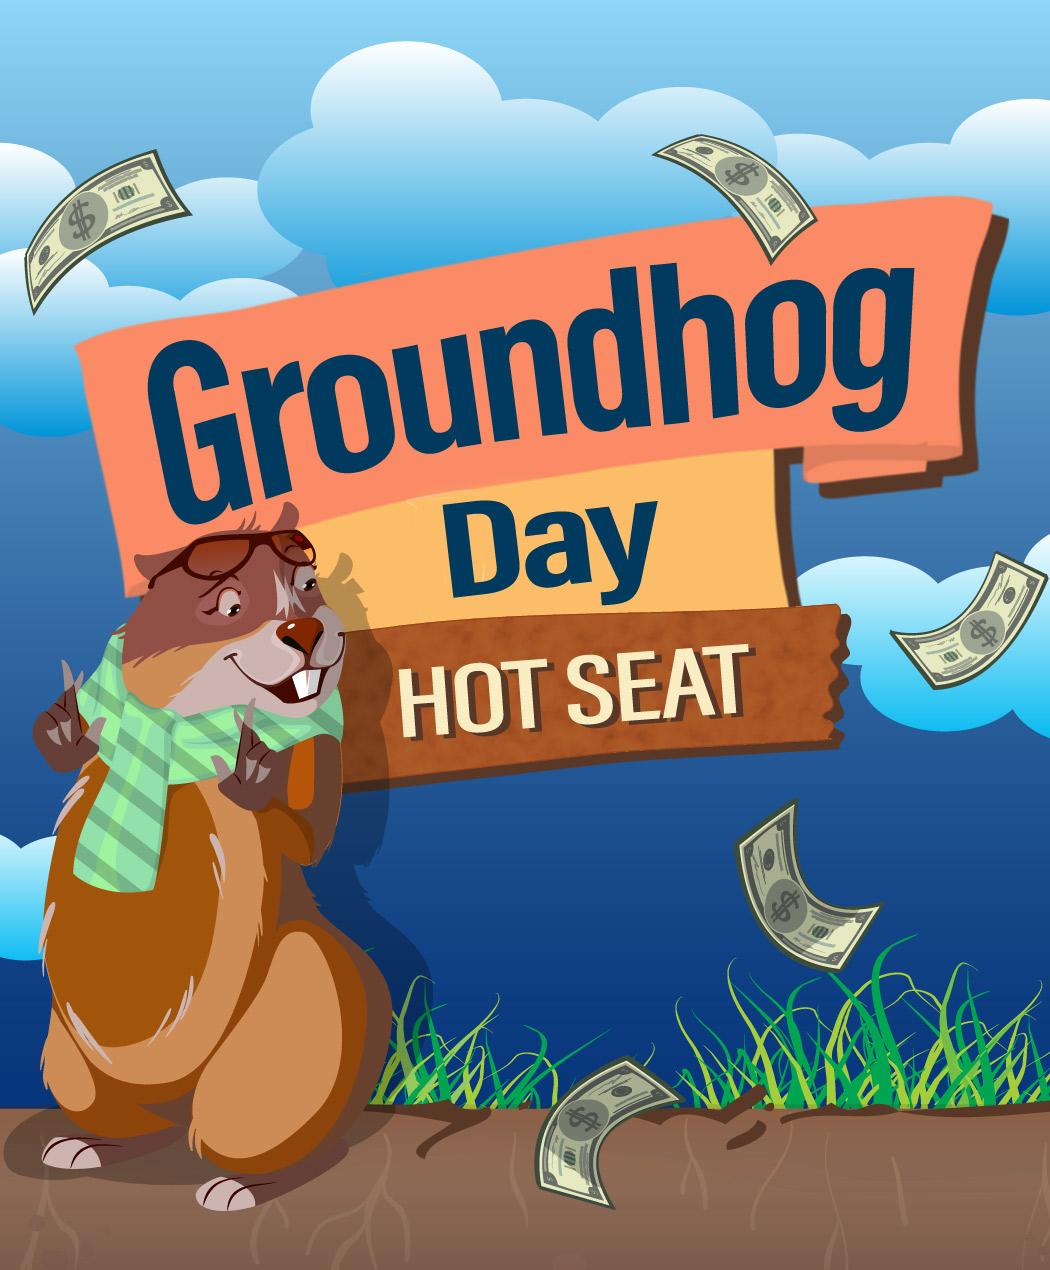 Groundhog Day Hot Seat